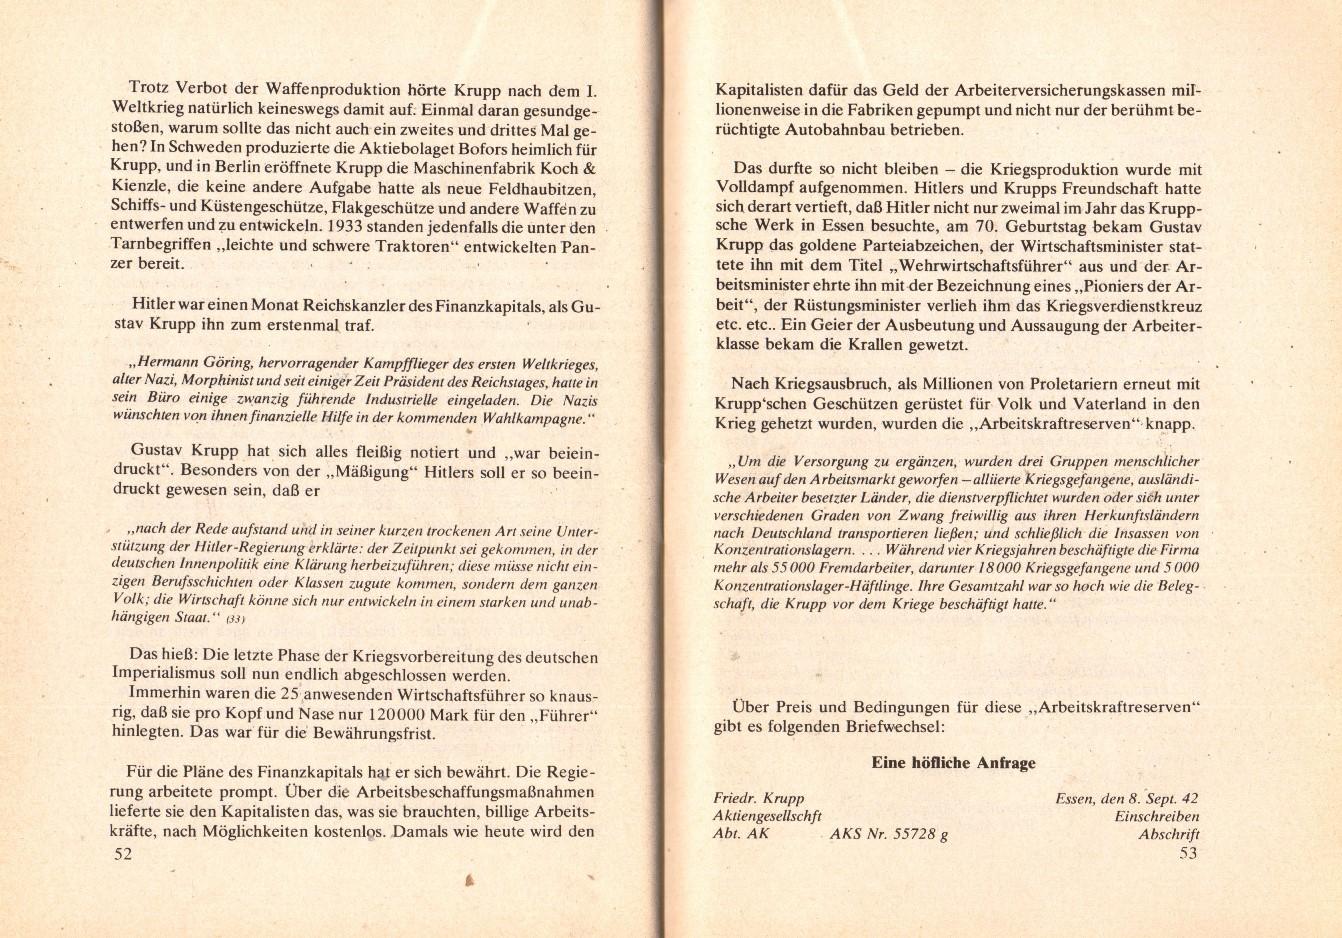 NRW_KBW_1977_Politik_der_Kohle_u_Stahlbarone_28